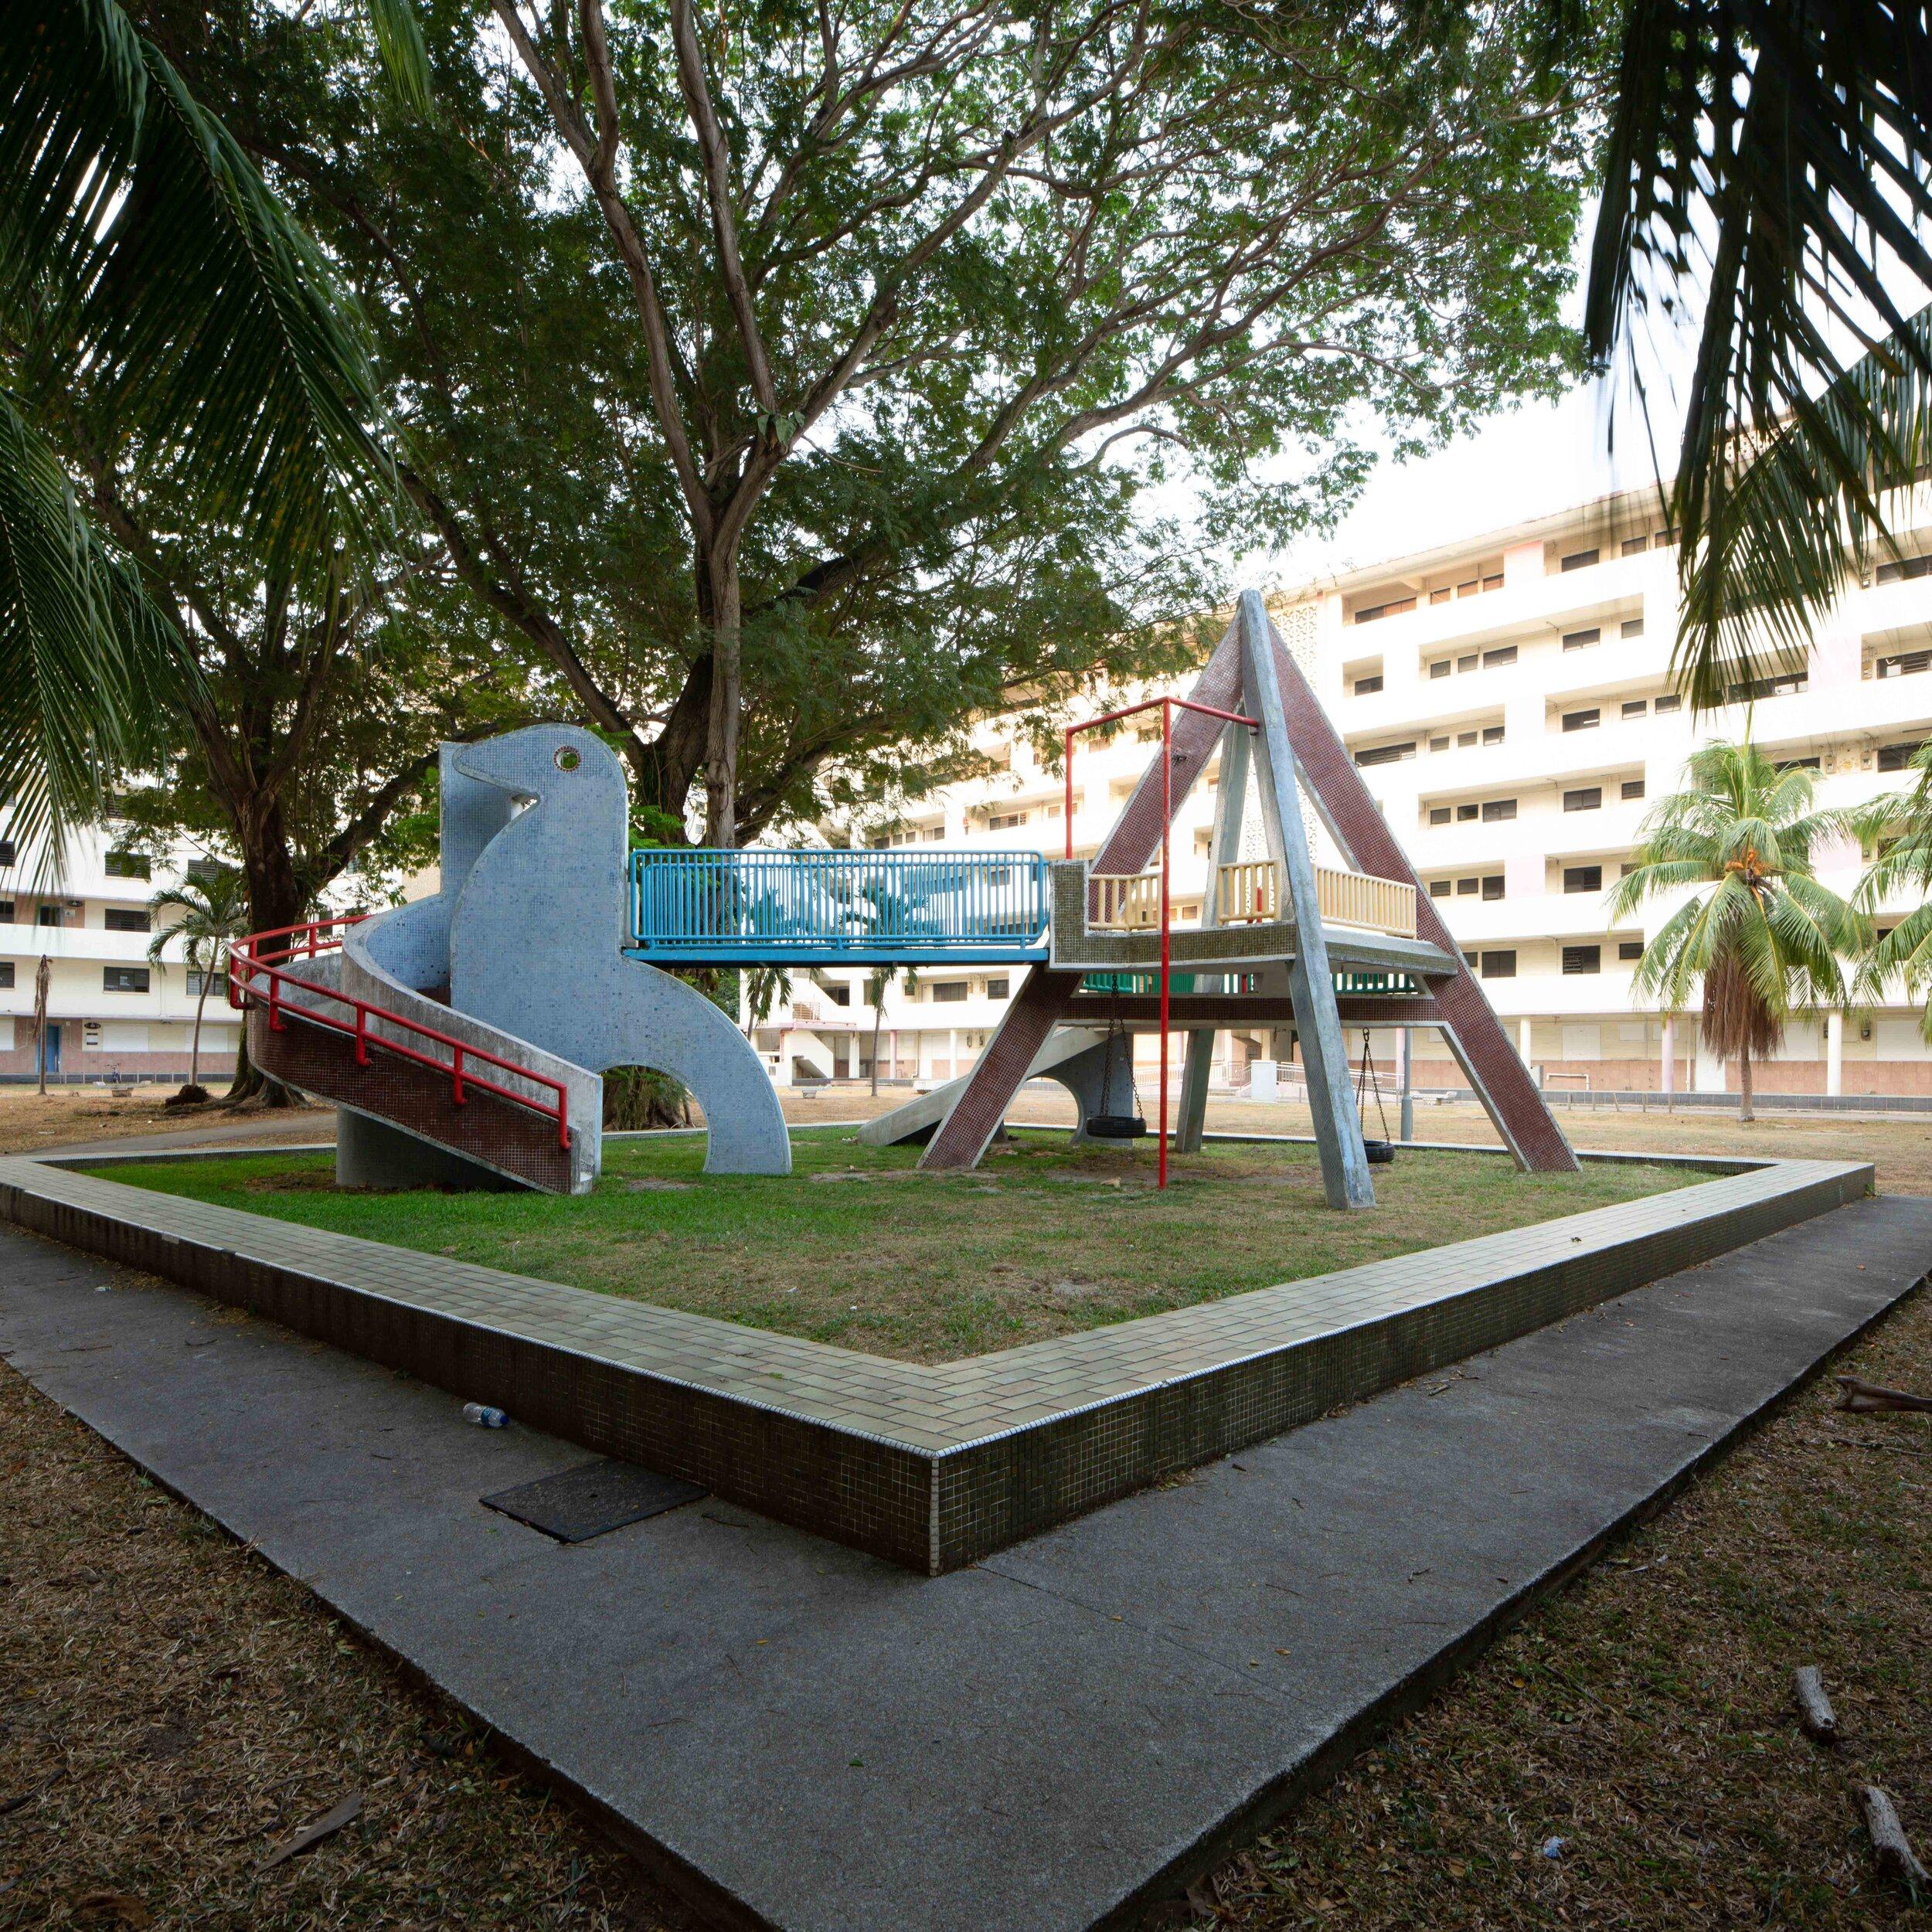 The Dove Playground